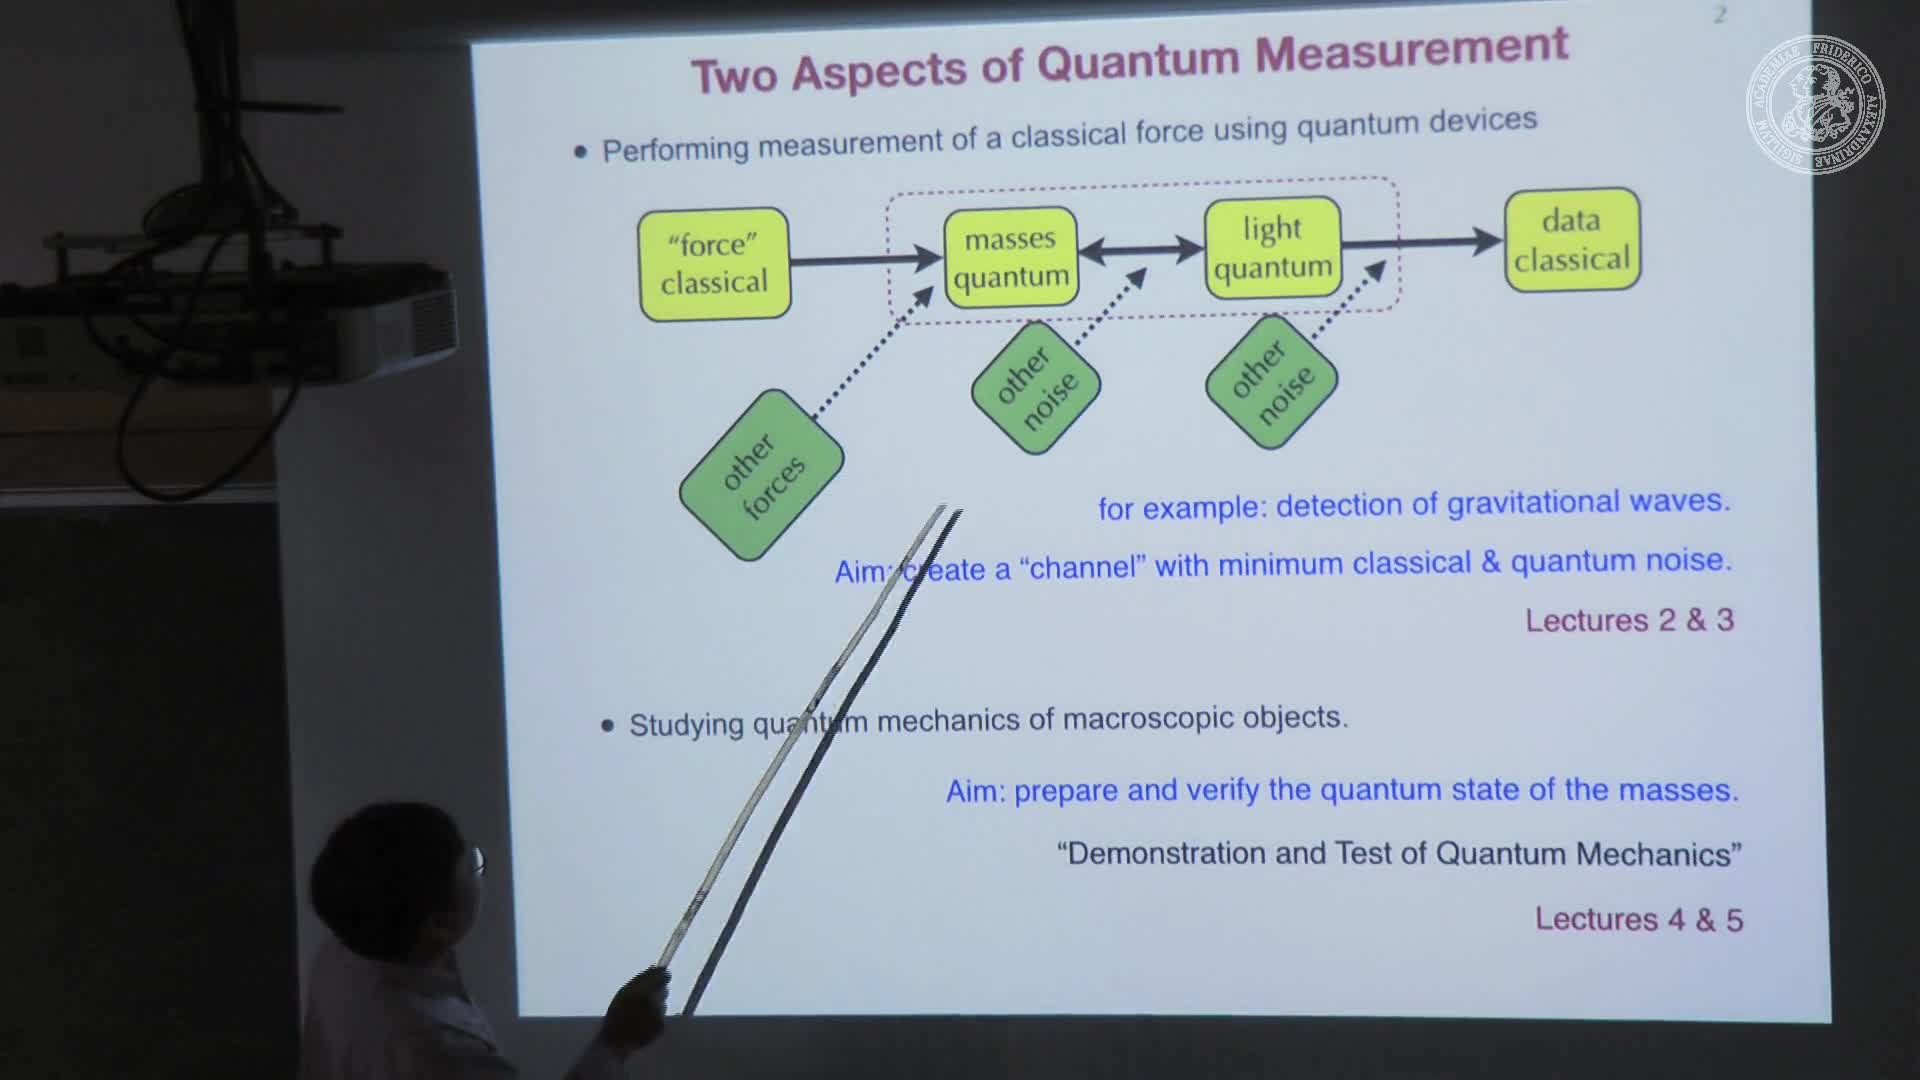 Quantum Optomechanics: from Gravitational Wave Detectors to Macroscopic Quantum Mechanics - 4 preview image